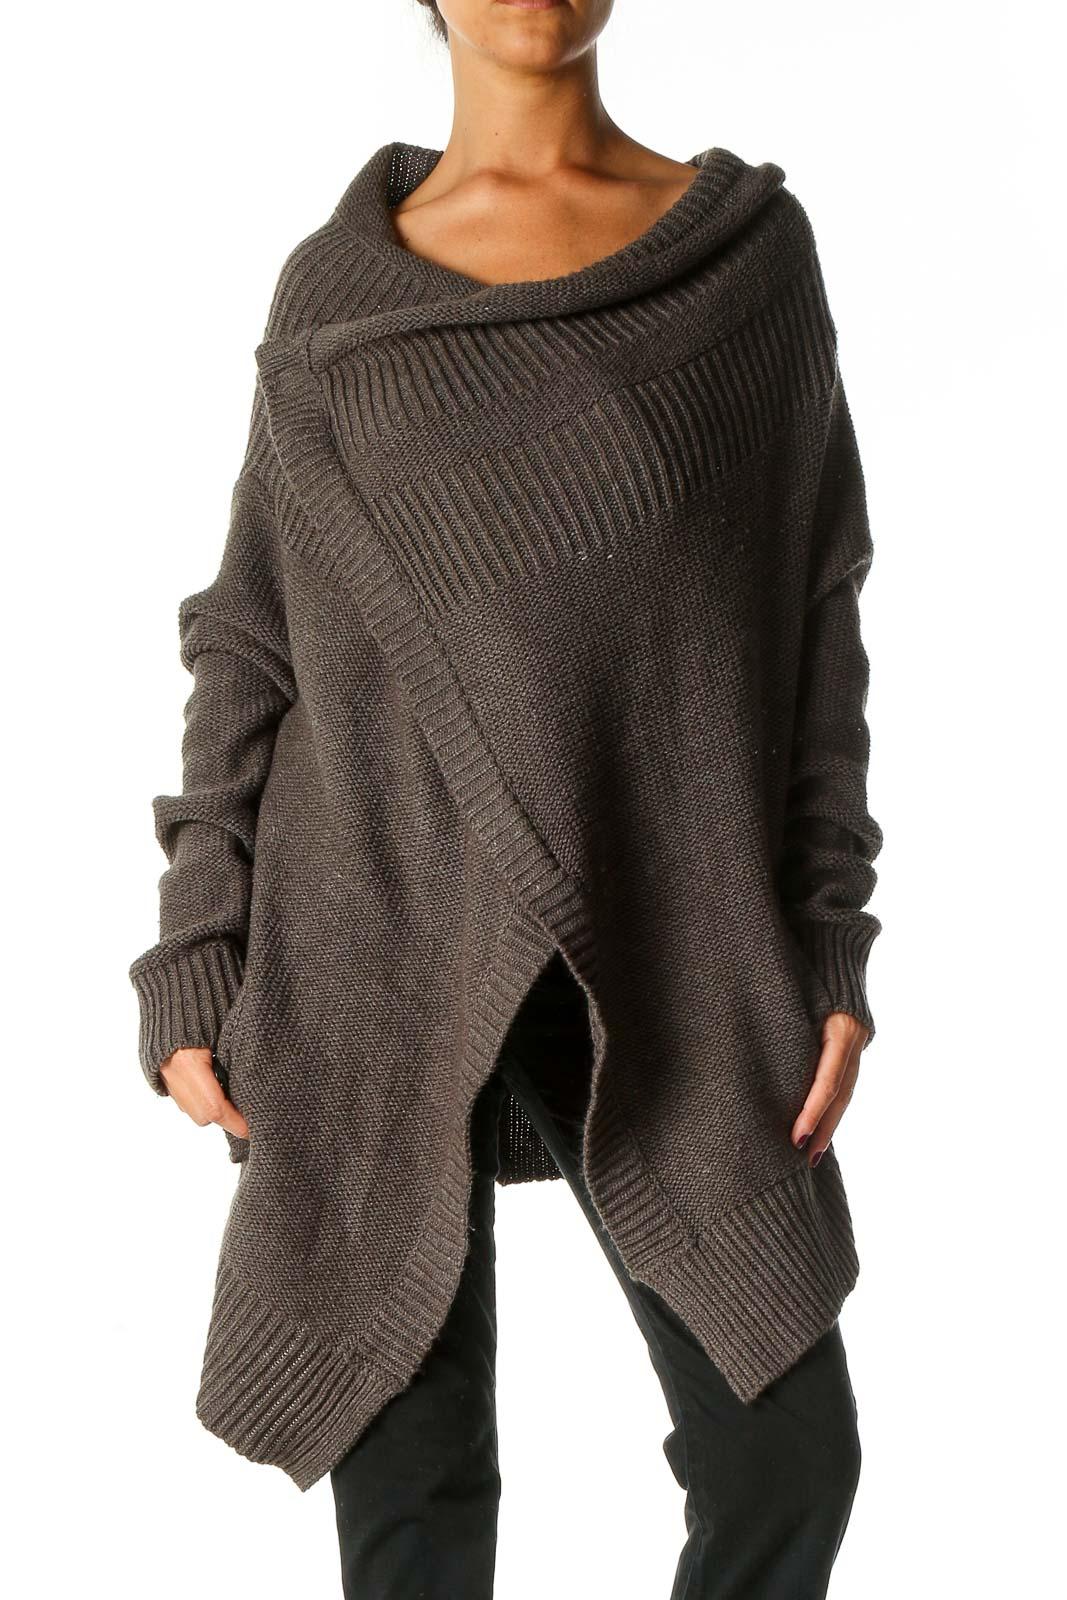 Brown Textured Cardigan Front